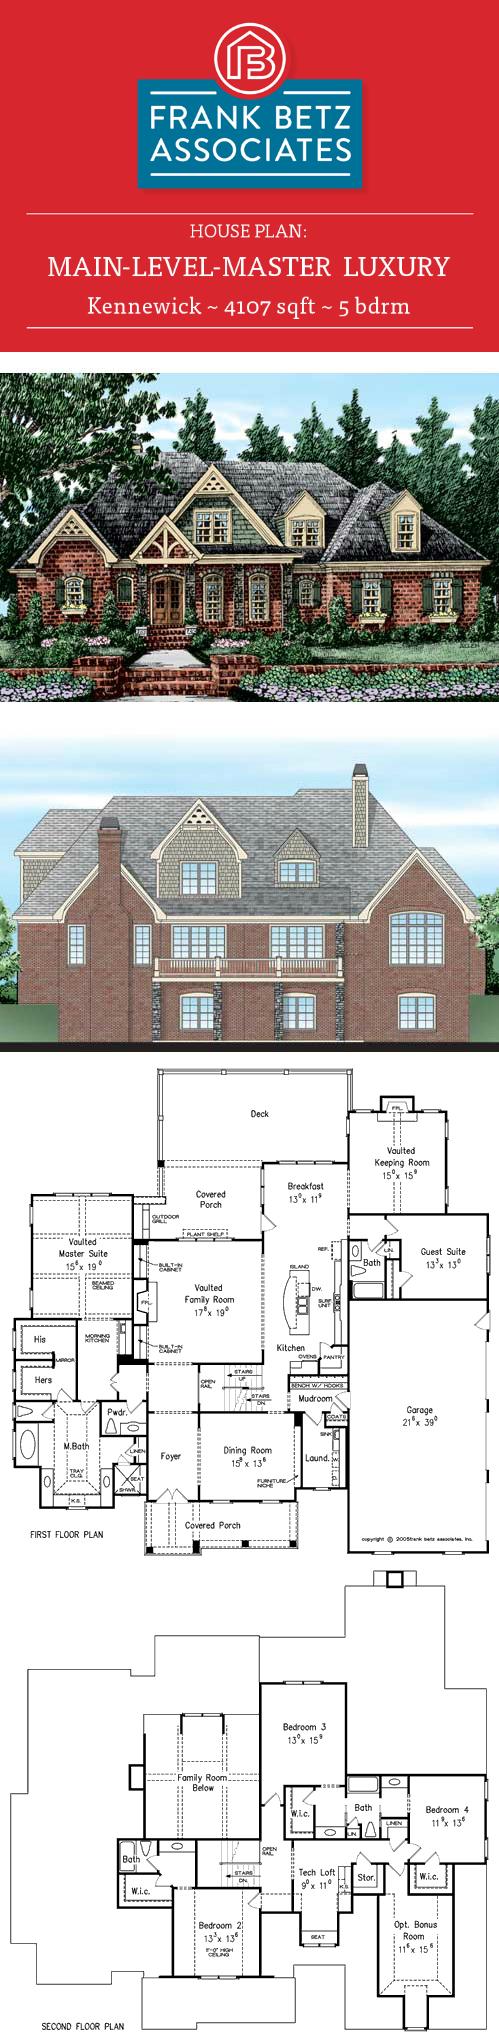 Kennewick: 4107 sqft, 5 bdrm, Main-level-master, Luxury house plan design by Frank Betz Associates Inc. #houseplan #frankbetz #housedesign